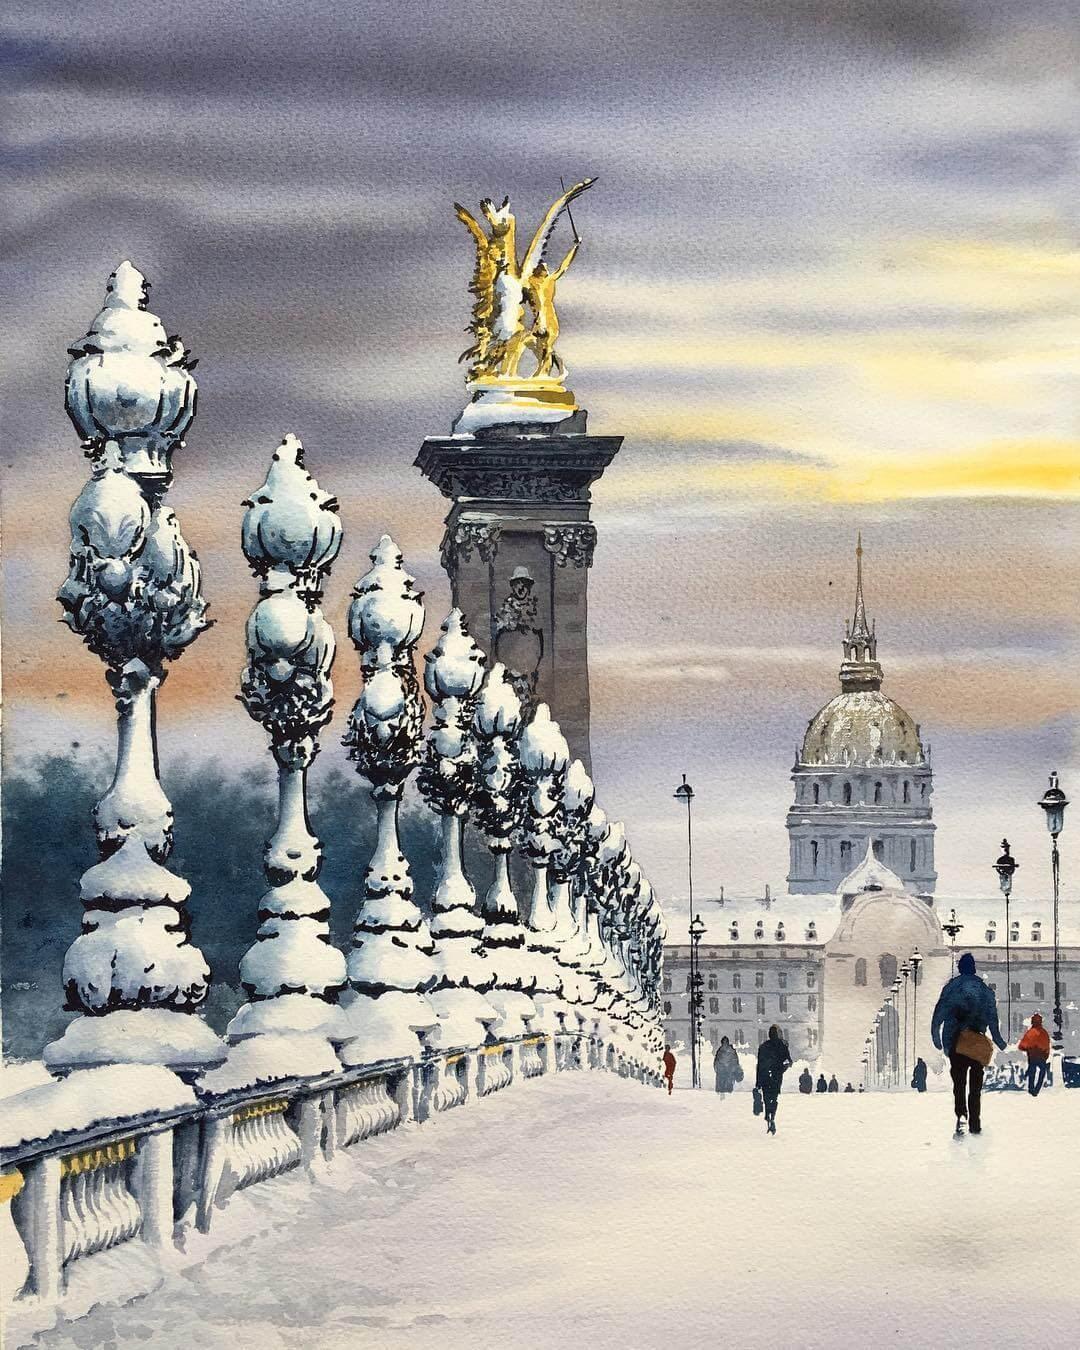 13-Pont-Alexander-III-Igor-Dubovoy-Realistic-Urban-Watercolor-Paintings-www-designstack-co